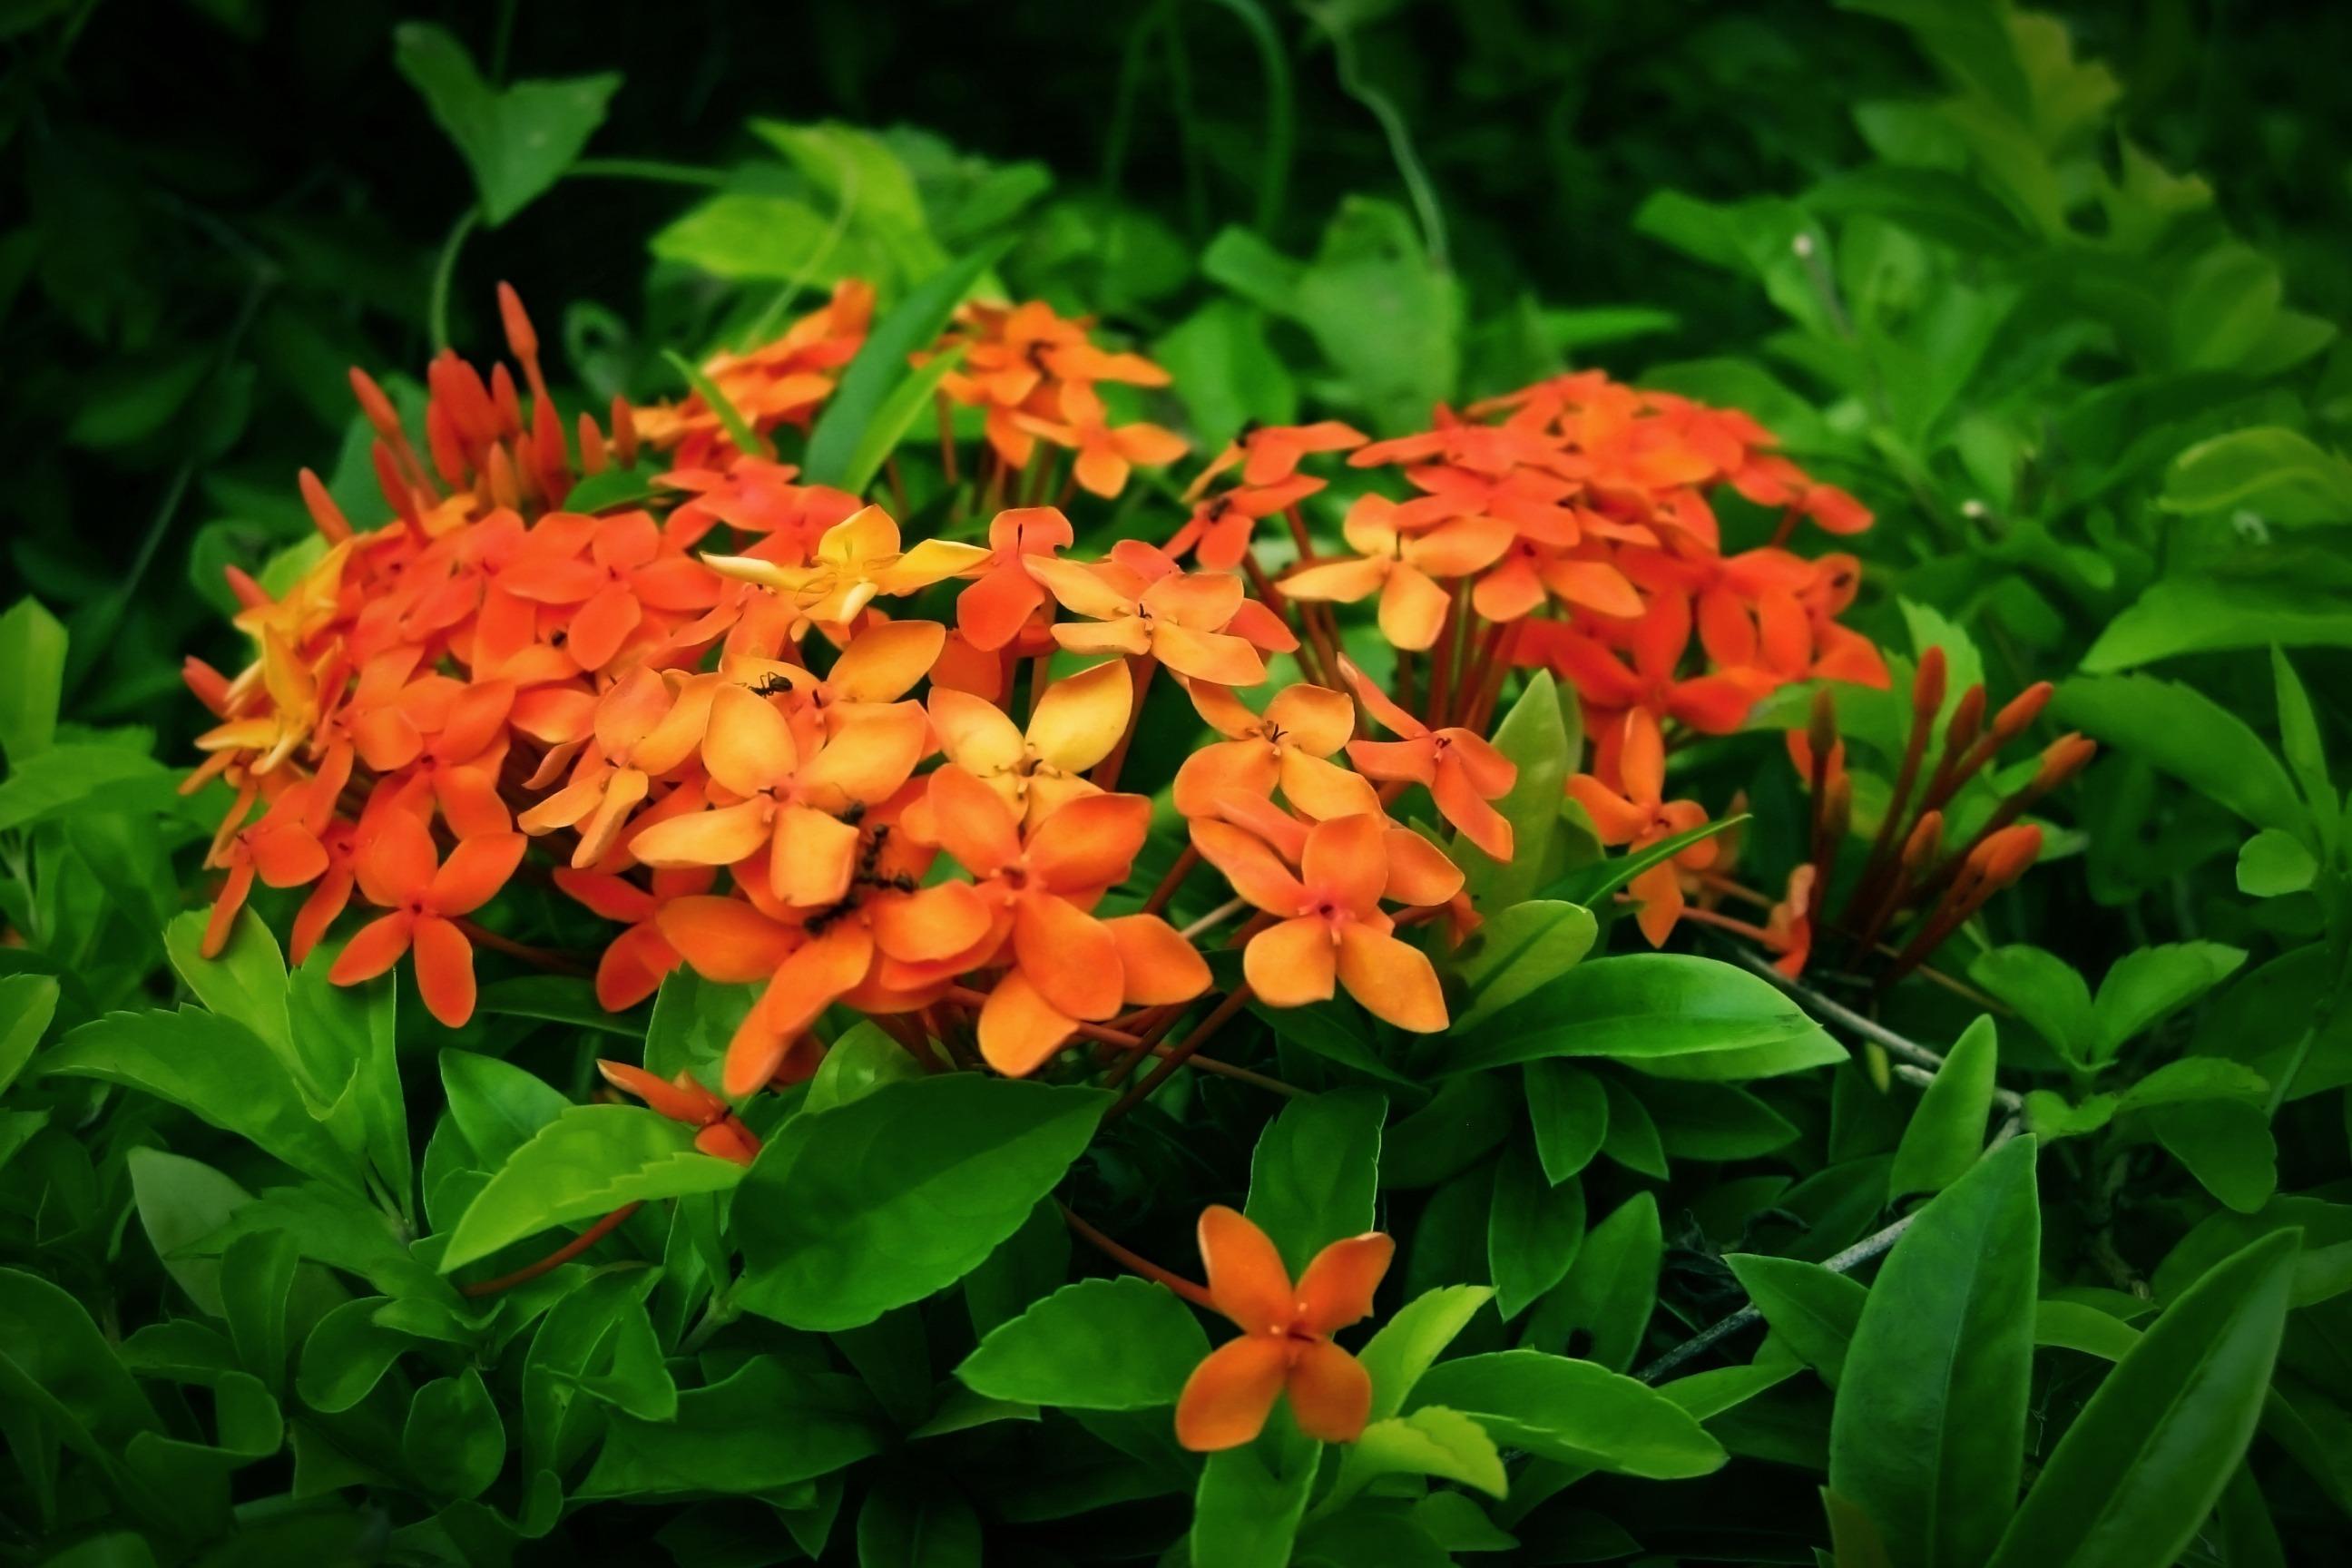 Shrub With Small Orange Flowers Free Image